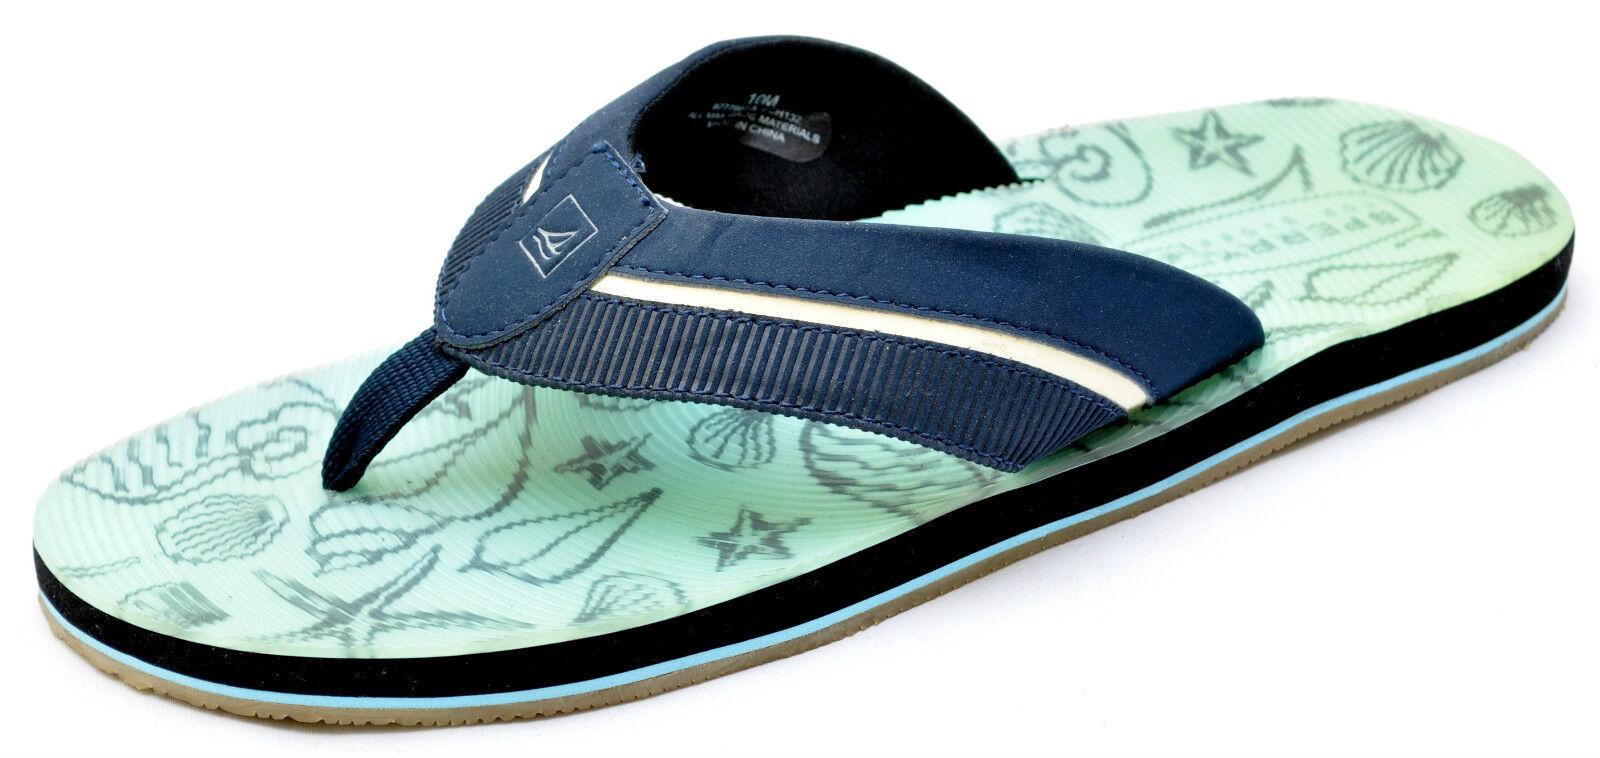 Sperry Flops Top-Sider CAMINO THONG Navy Blue Print Flip Flops Sperry Sandals Women's - NEW b6afe1